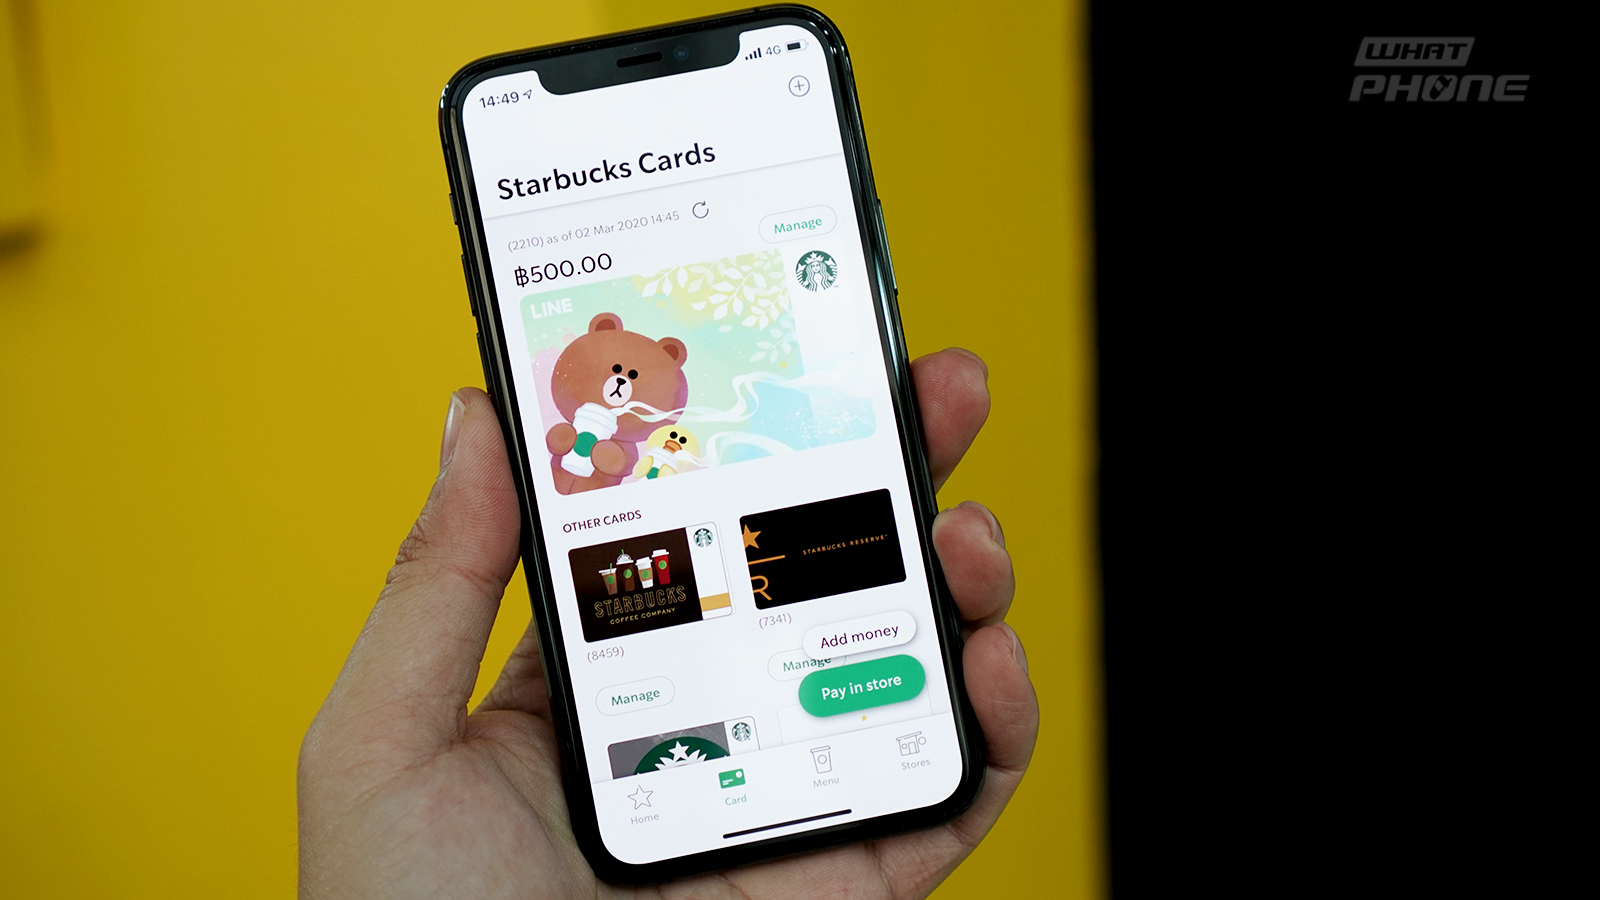 Starbucks Thailand x LINE ครั้งแรกของ Starbucks Card ใน LINE เชื่อมต่อกับ Rabbit LINE Pay เติมเงินสะดวกขึ้น